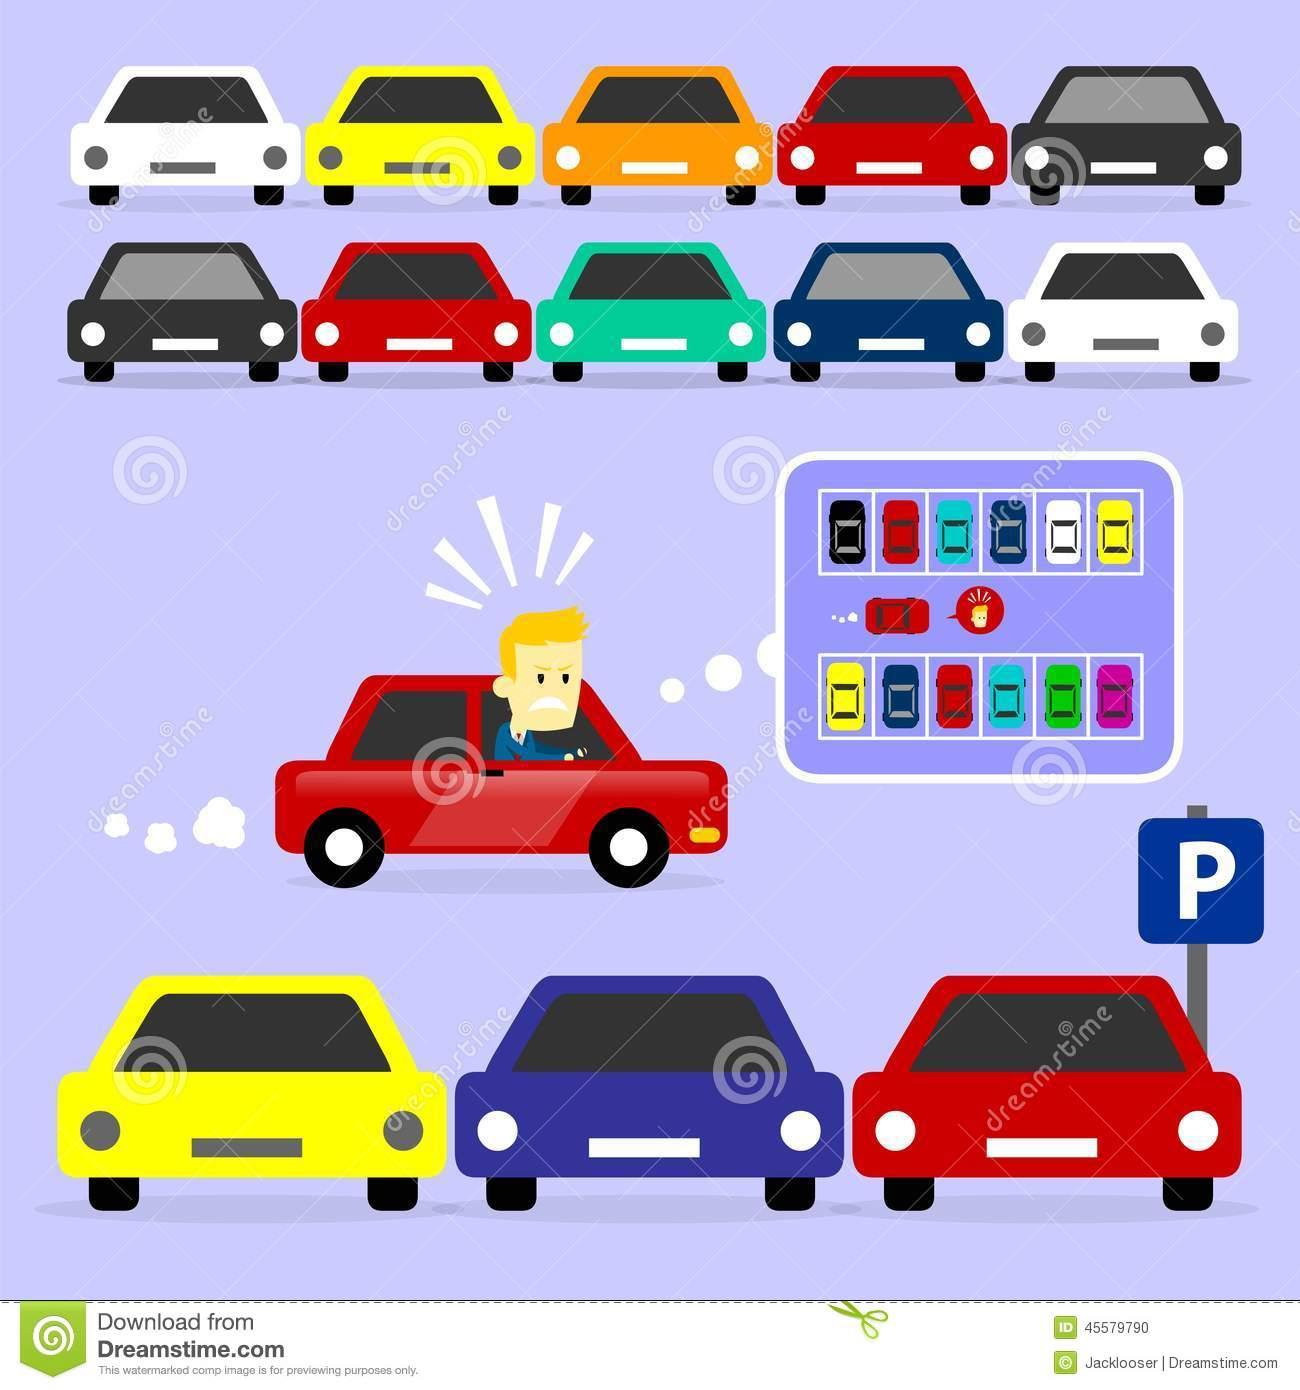 Cars on parking garage. ba574de84e33ac9e-Cars on parking garage. ba574de84e33ac9ec4617905ef209e .-9